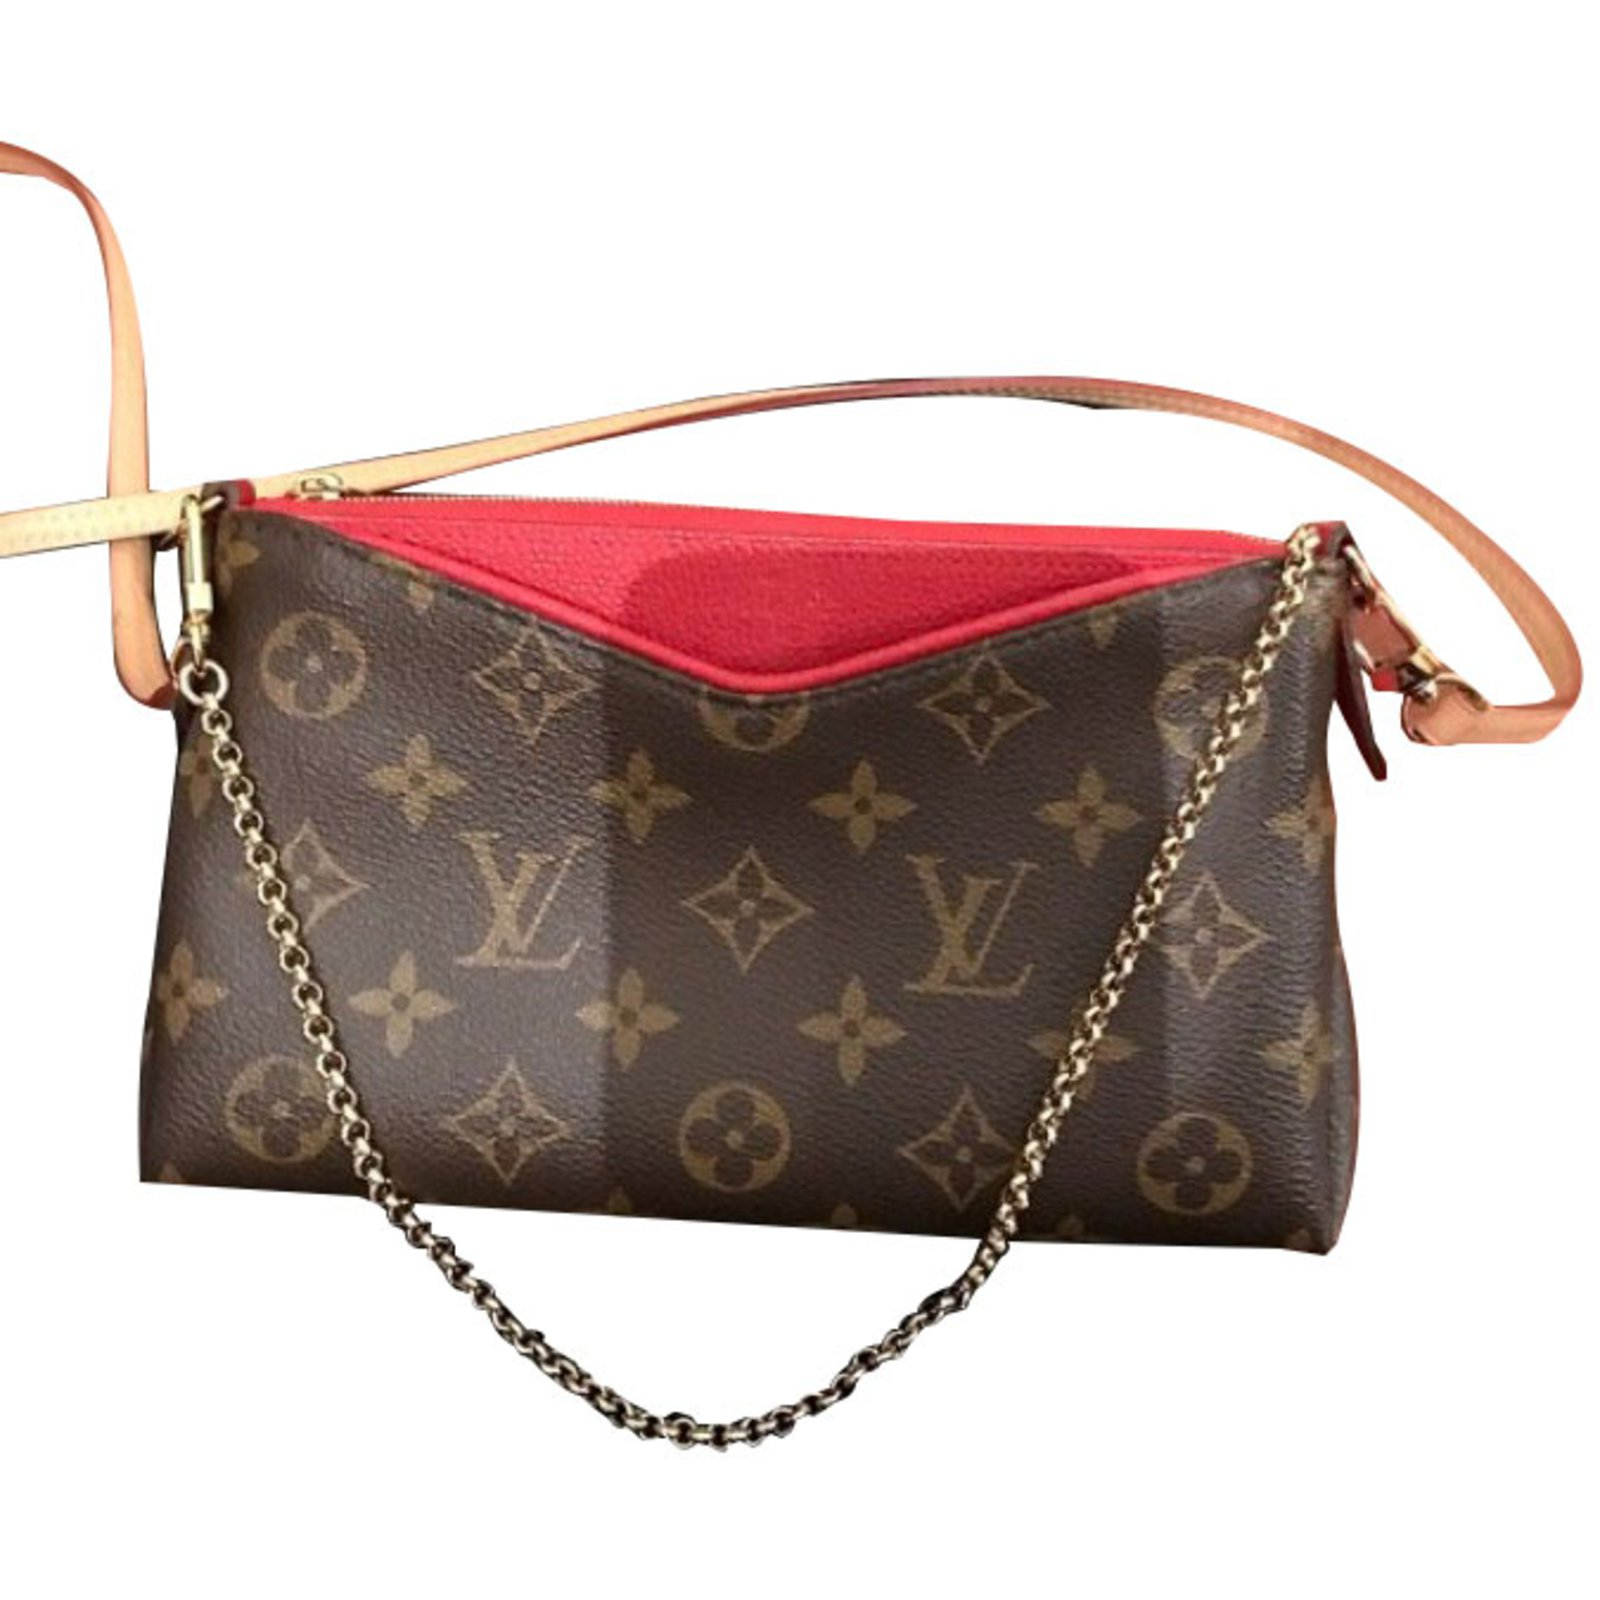 41668ffc2424 Louis Vuitton Pallas Handbags Other Brown